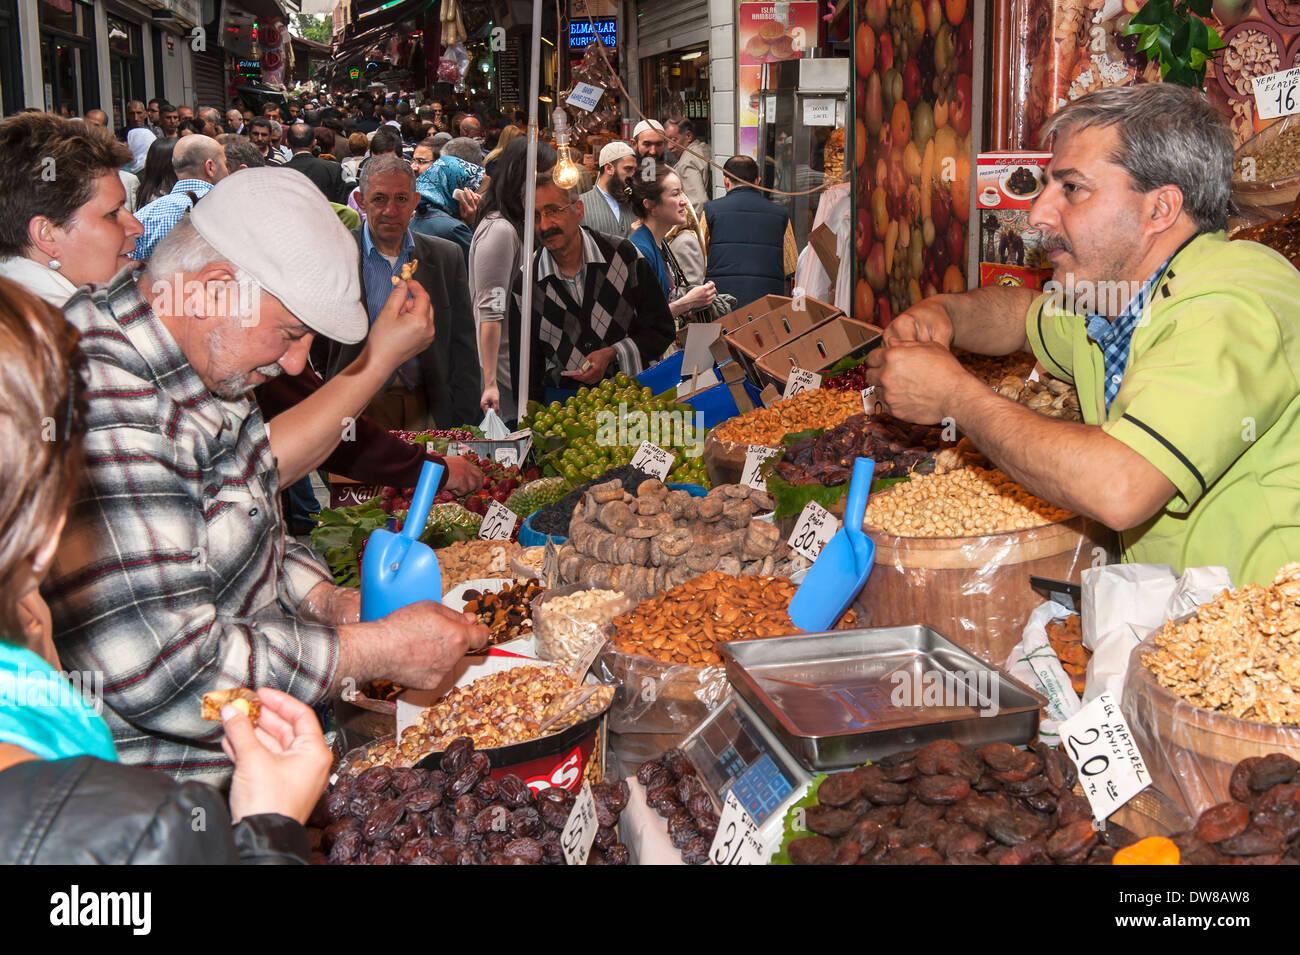 Egyptian bazaar, Istanbul, Turkey - Stock Image